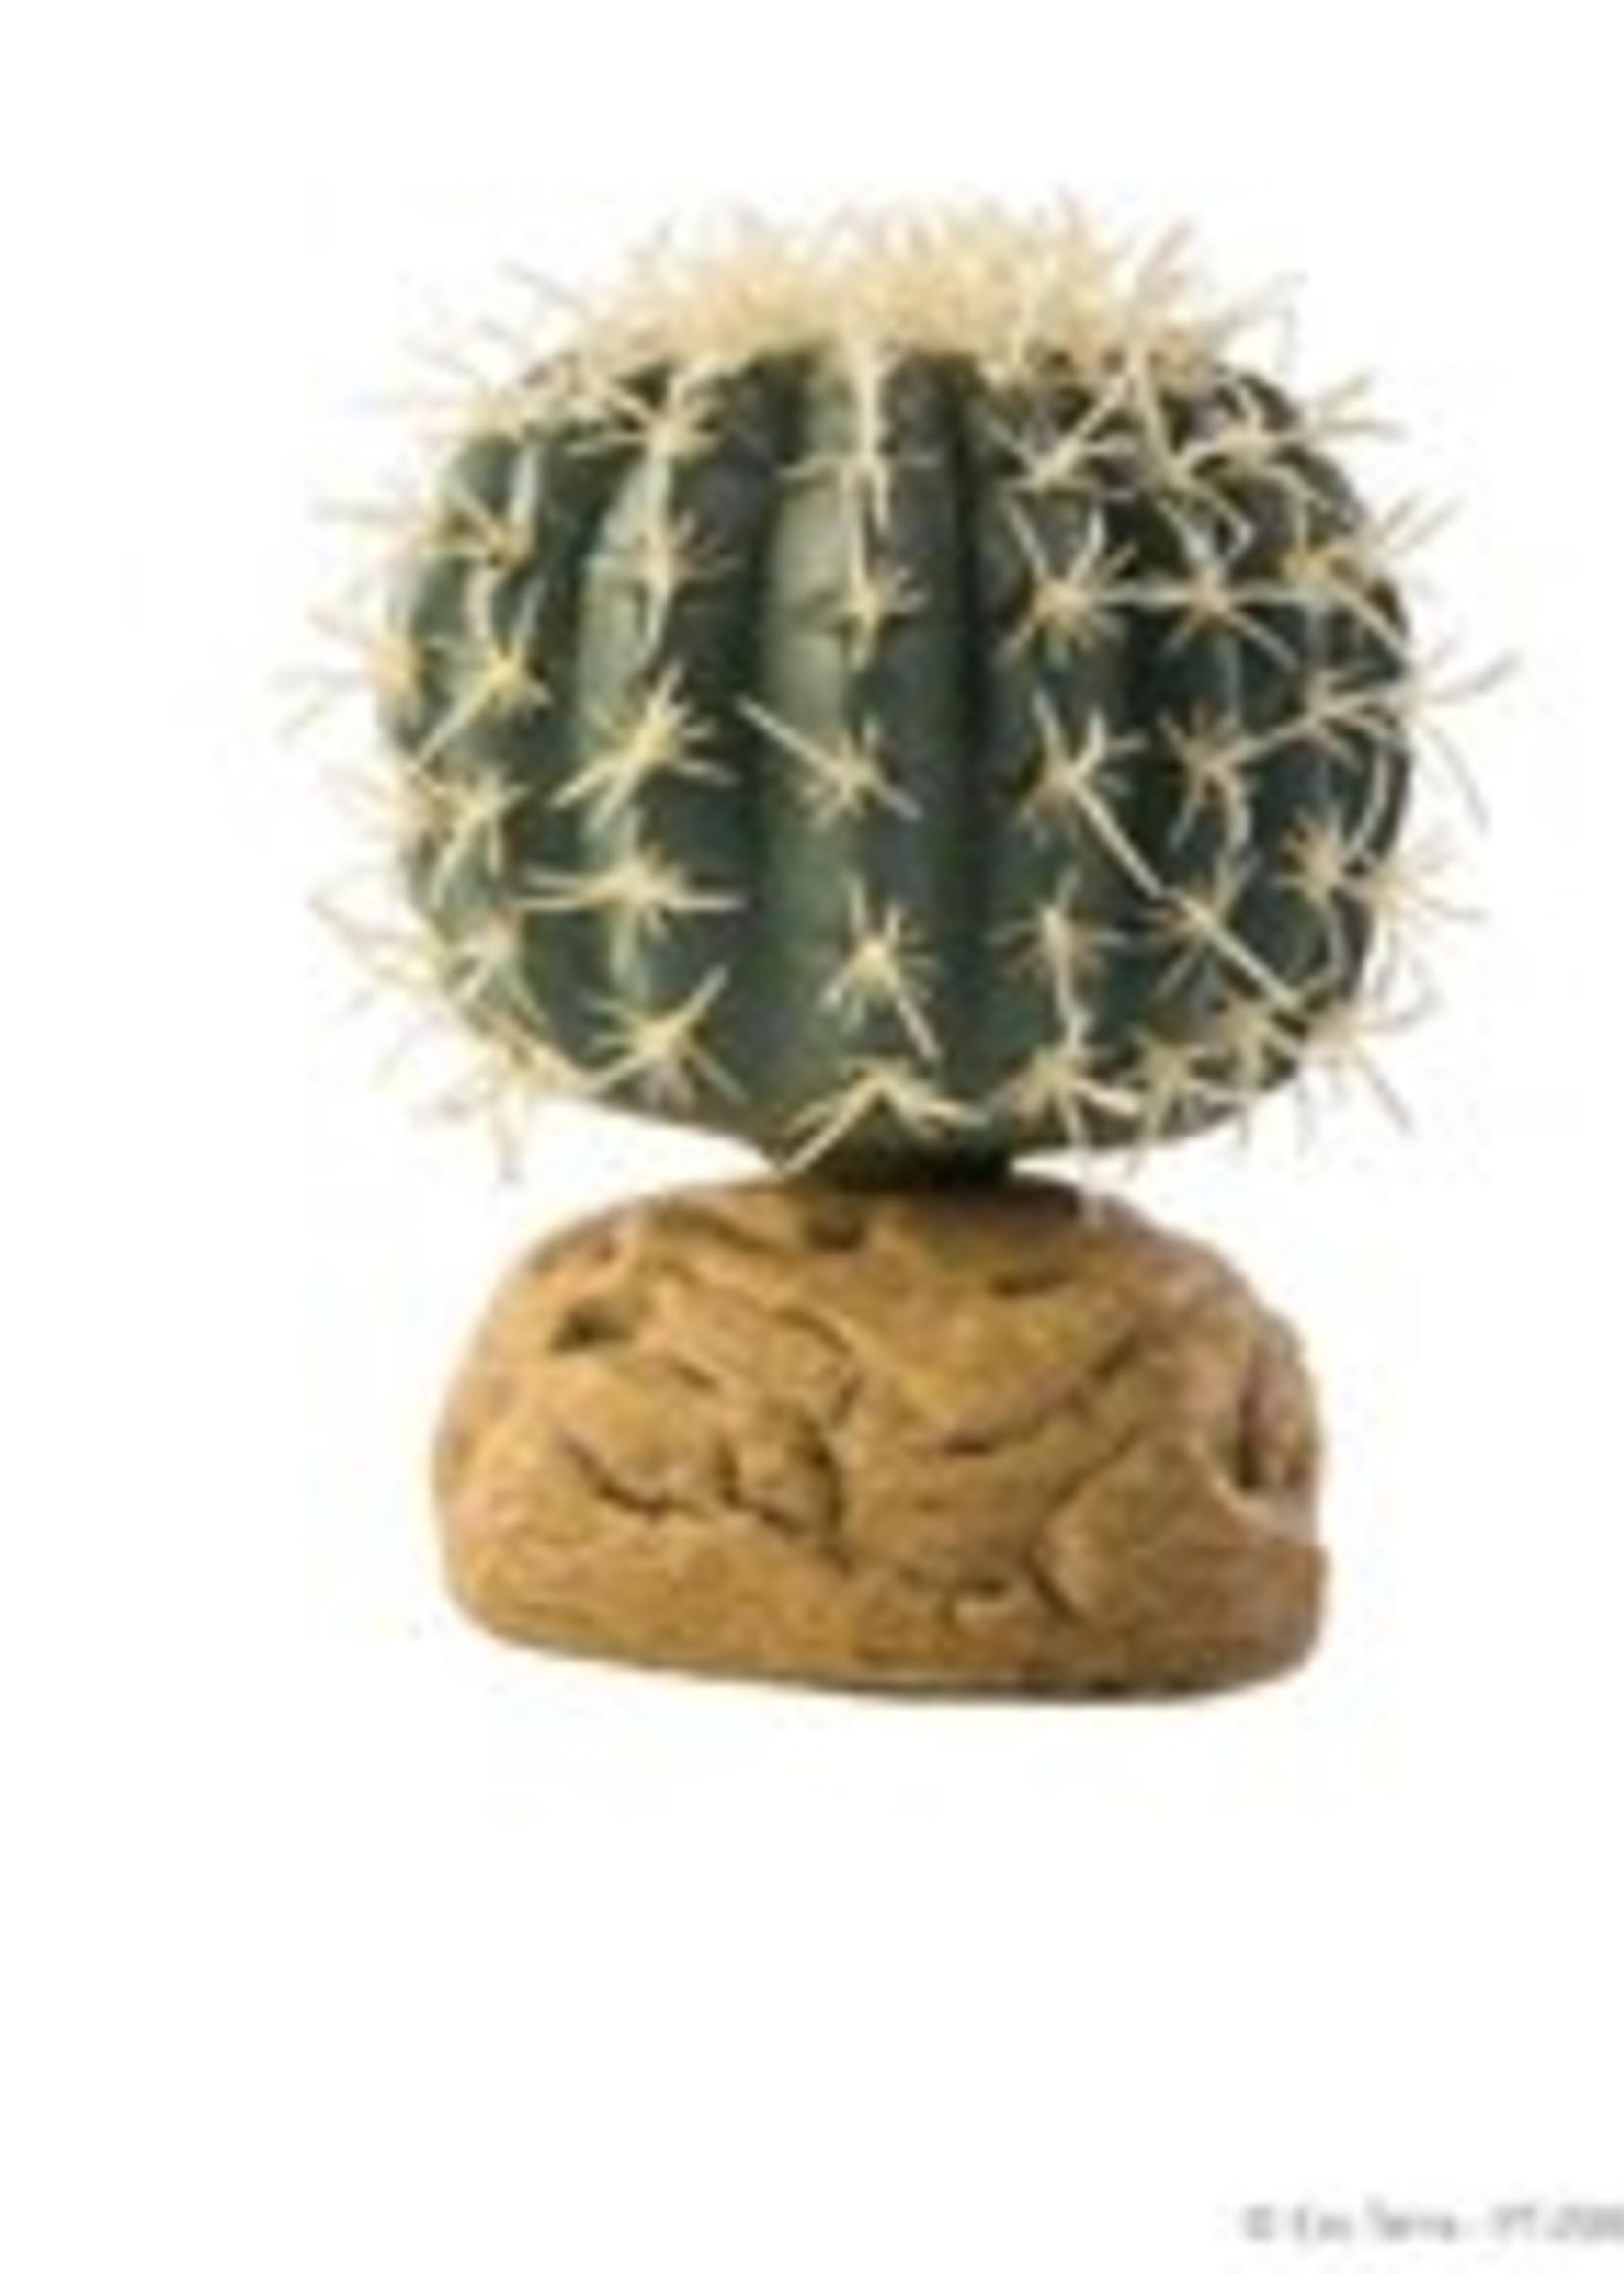 Exo Terra Desert Plant - Barrel Cactus - Small